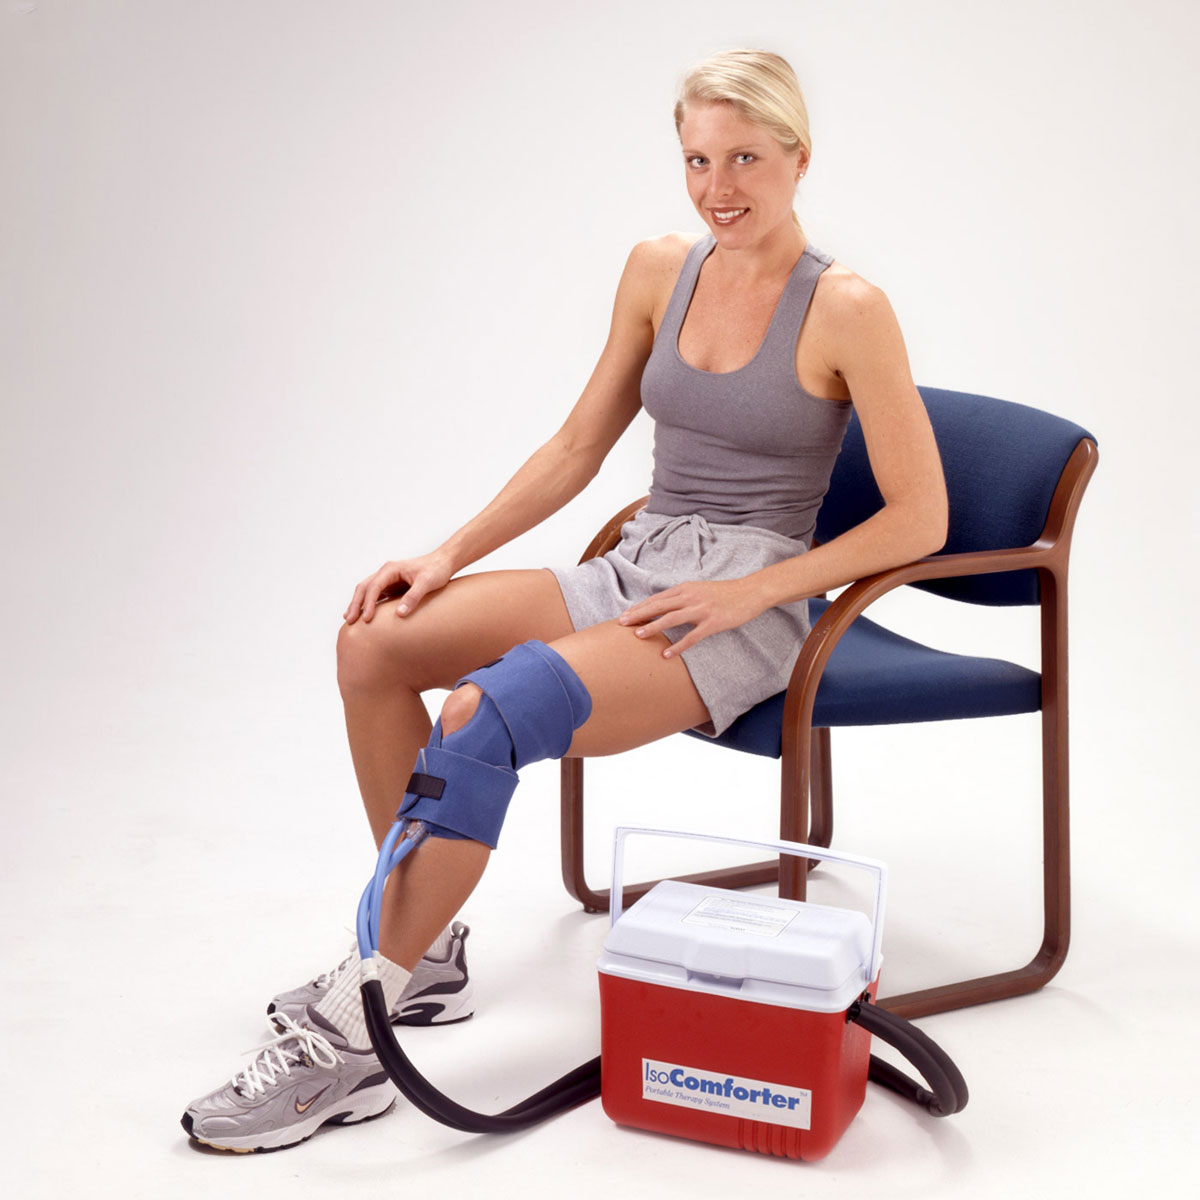 Санатории для лечения артроза коленного сустава 3ds max робота суставы